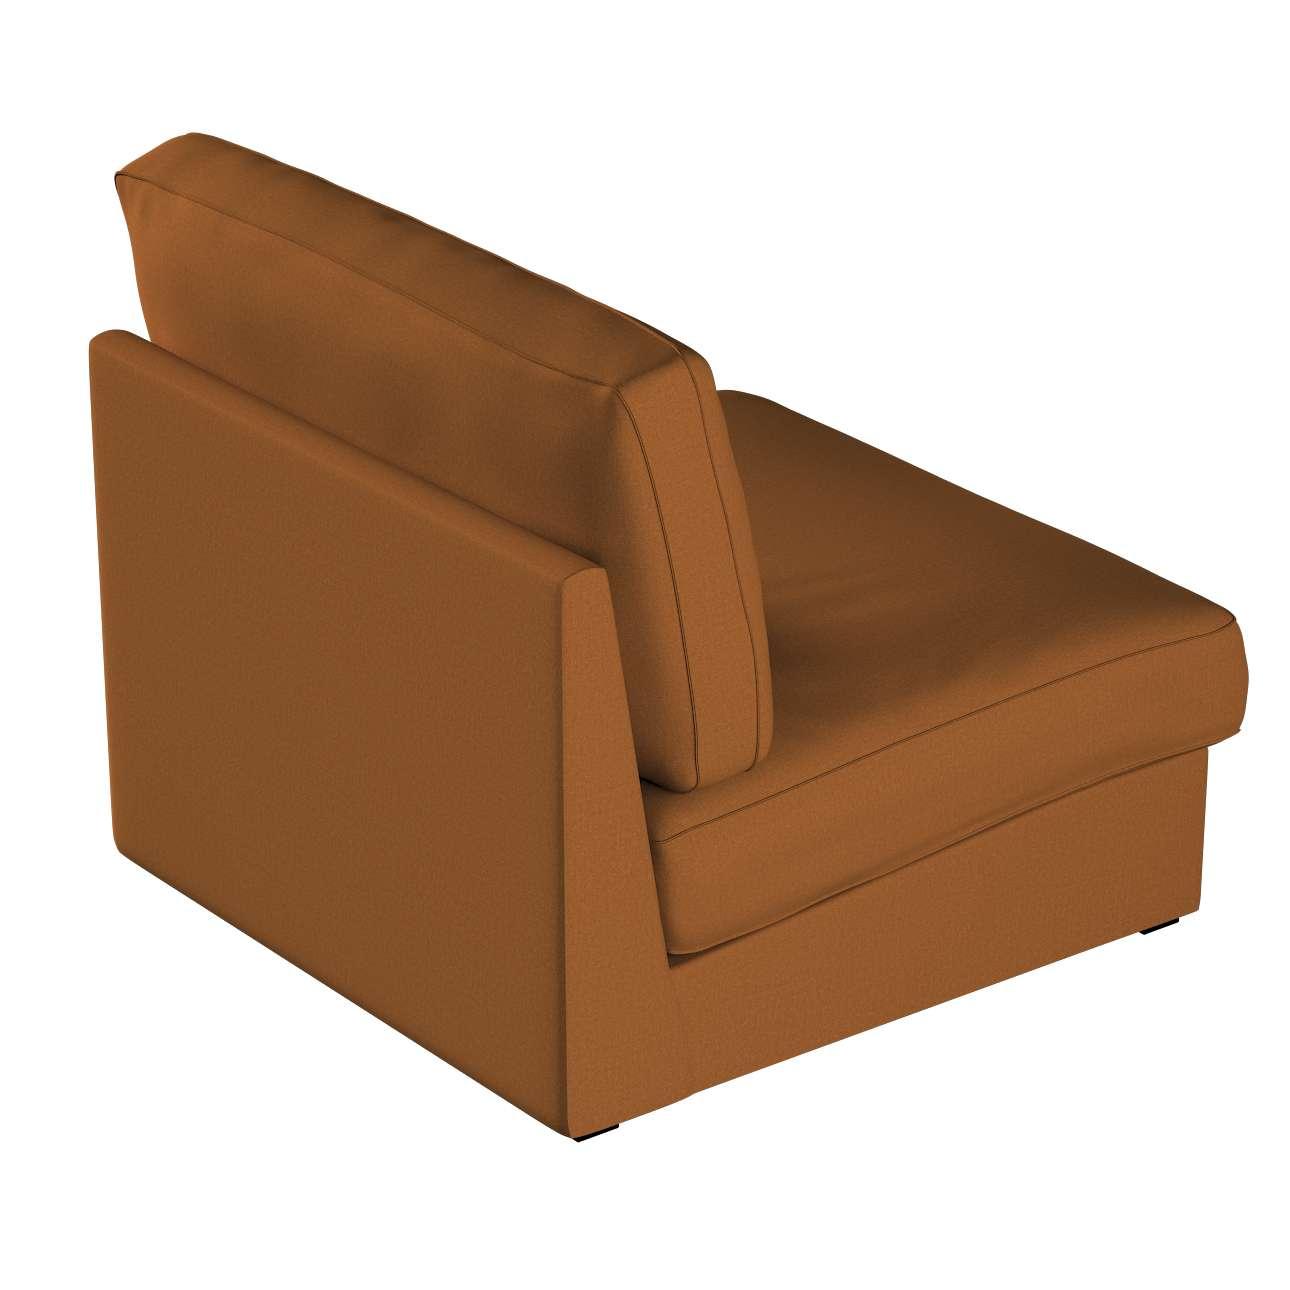 Pokrowiec na fotel Kivik w kolekcji Living, tkanina: 161-28